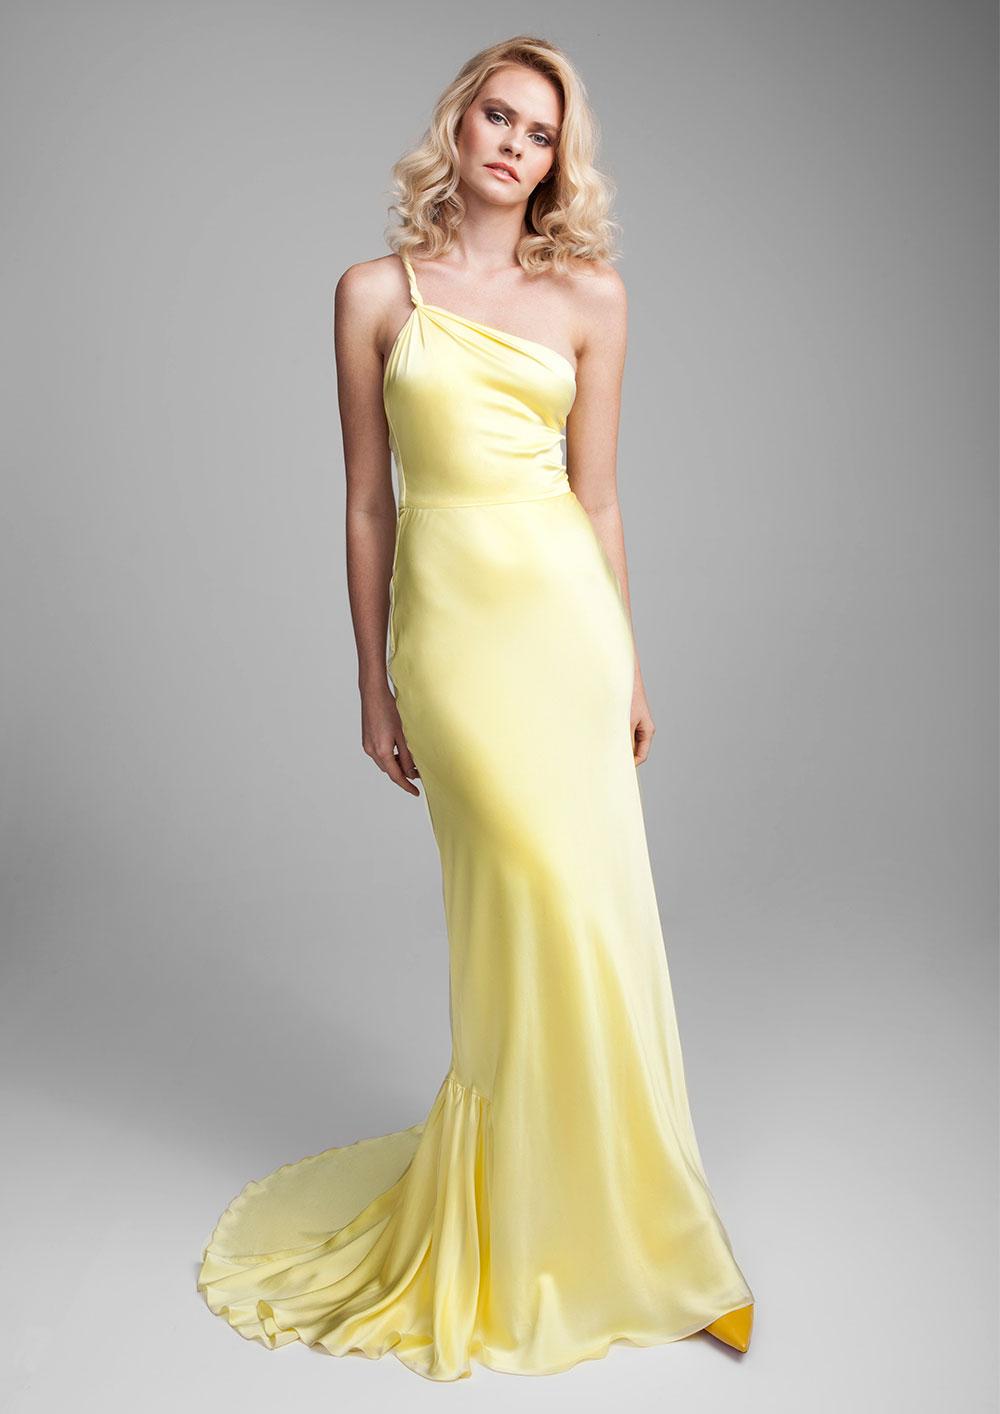 Delphinium Silk gown